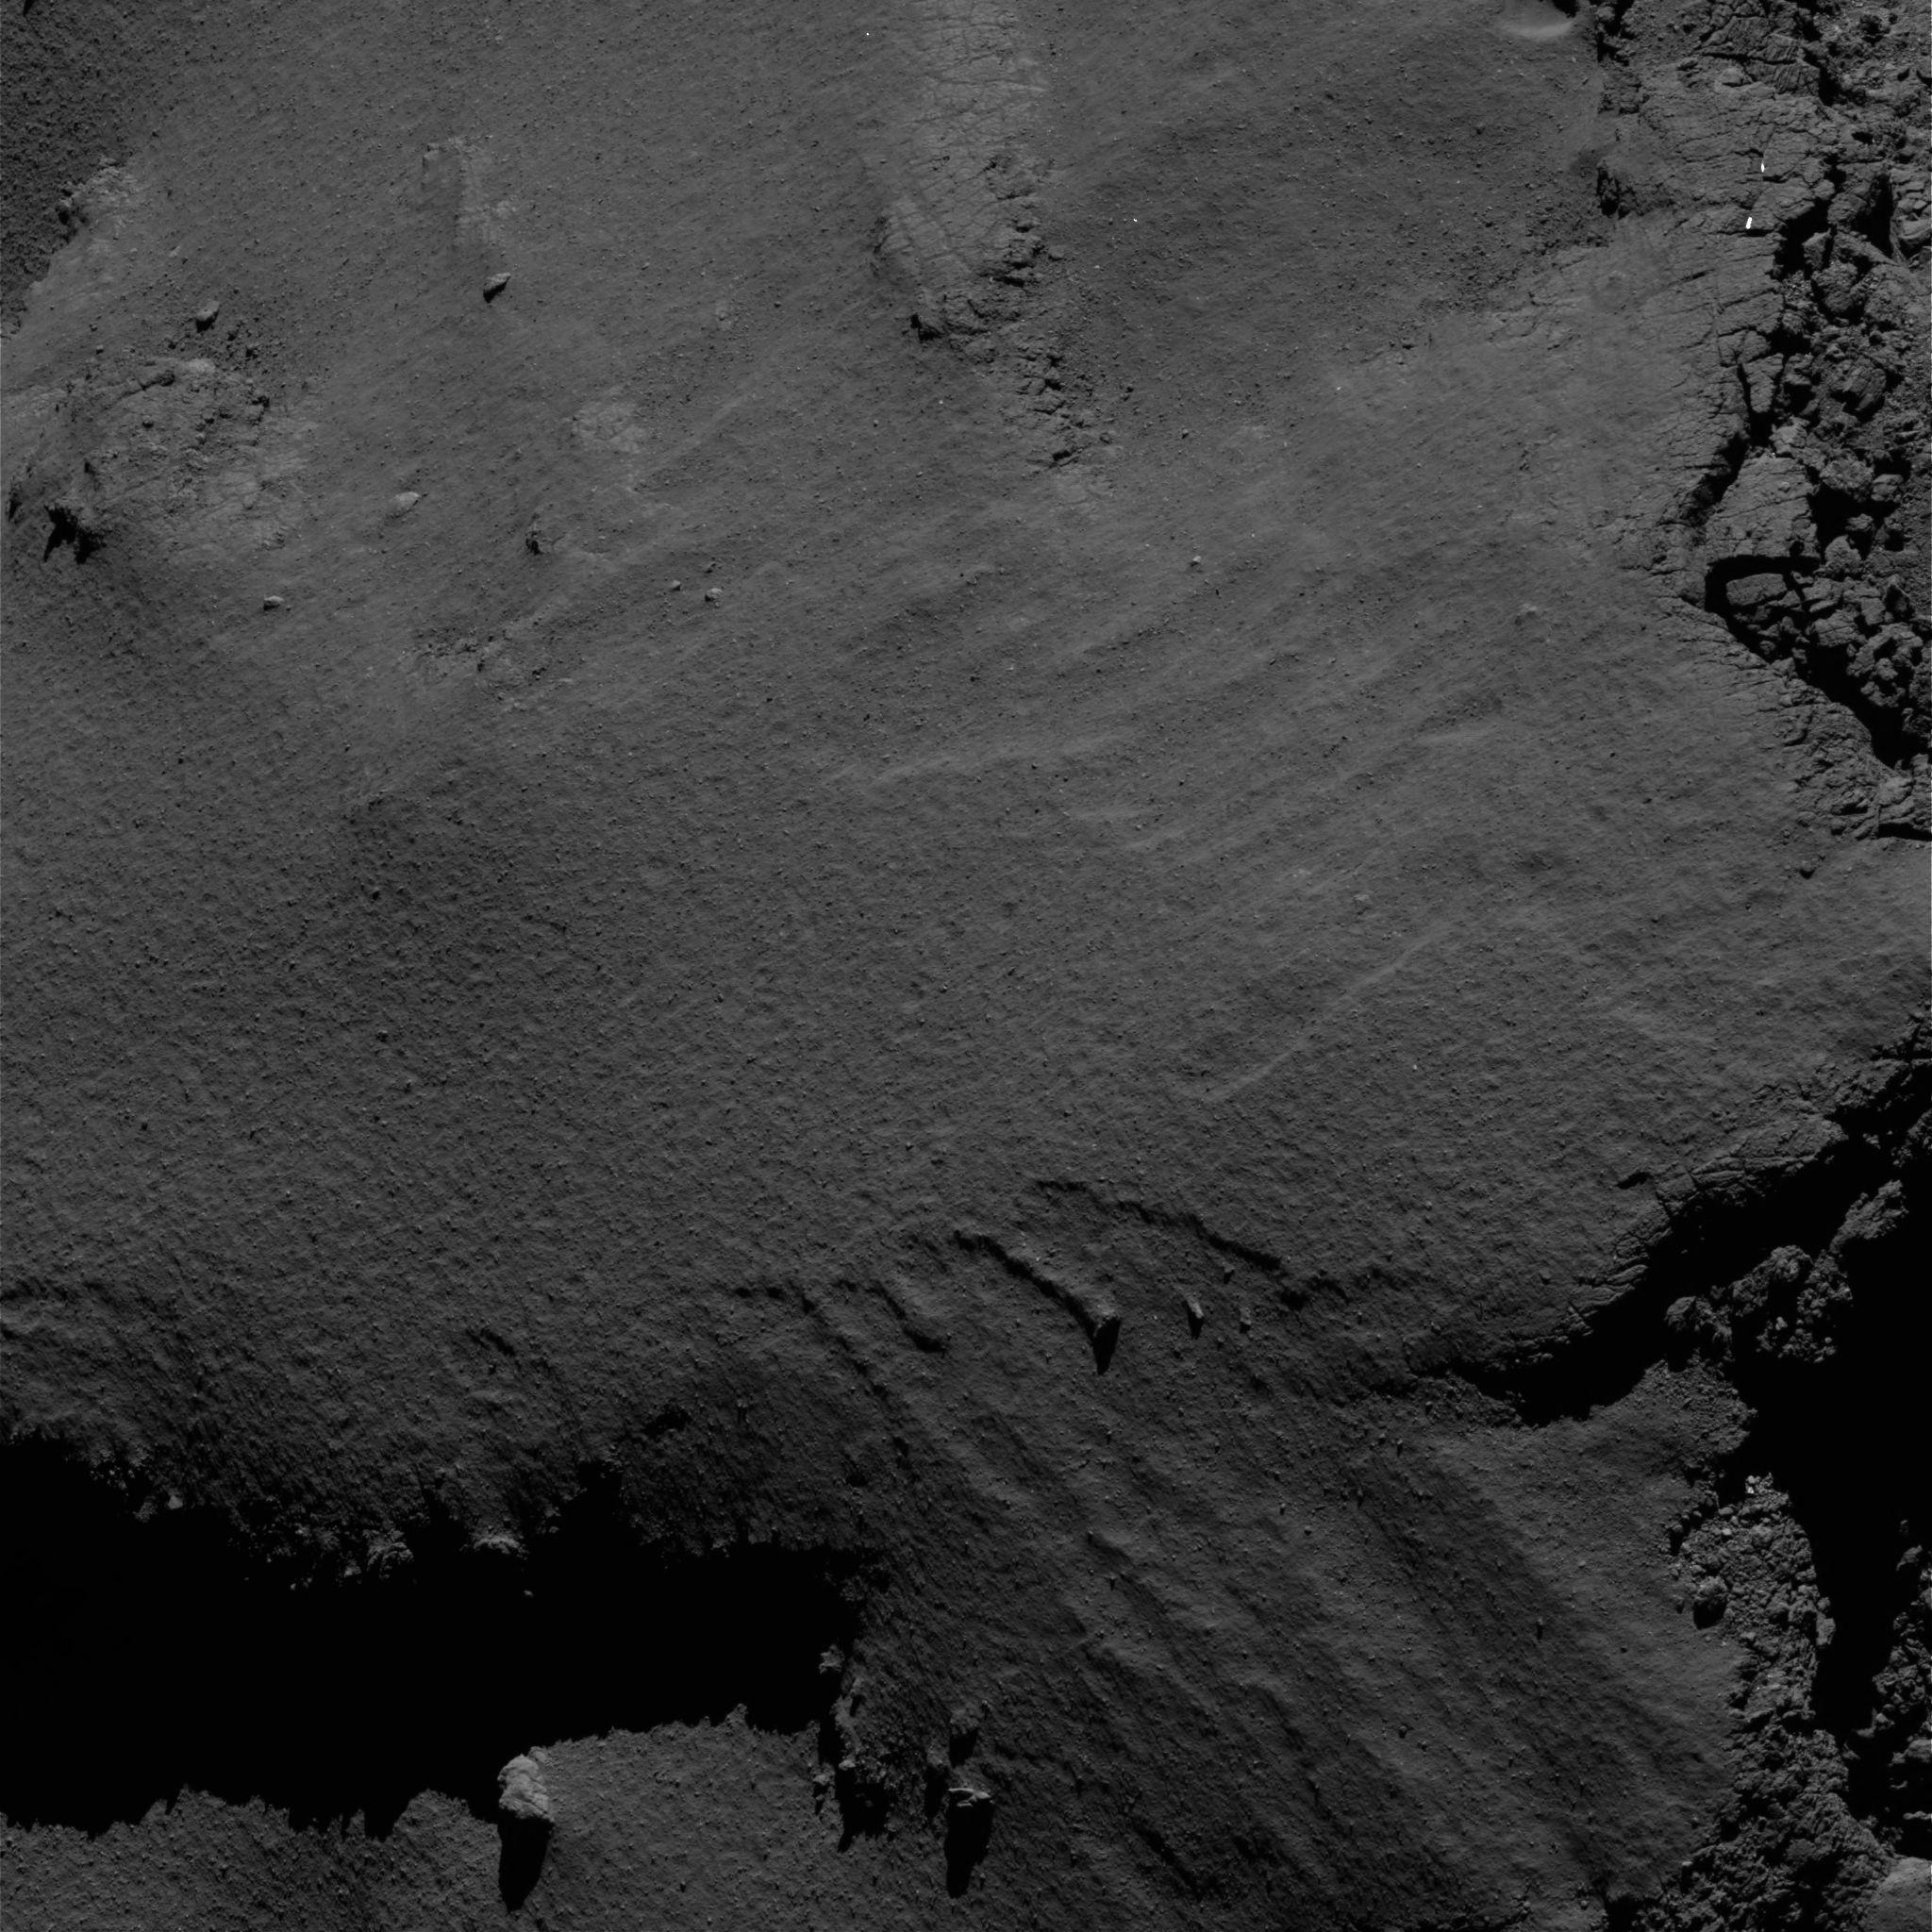 1567215487579-Rosetta_OSIRIS_NAC_comet_67P_20160812T203736.jpg